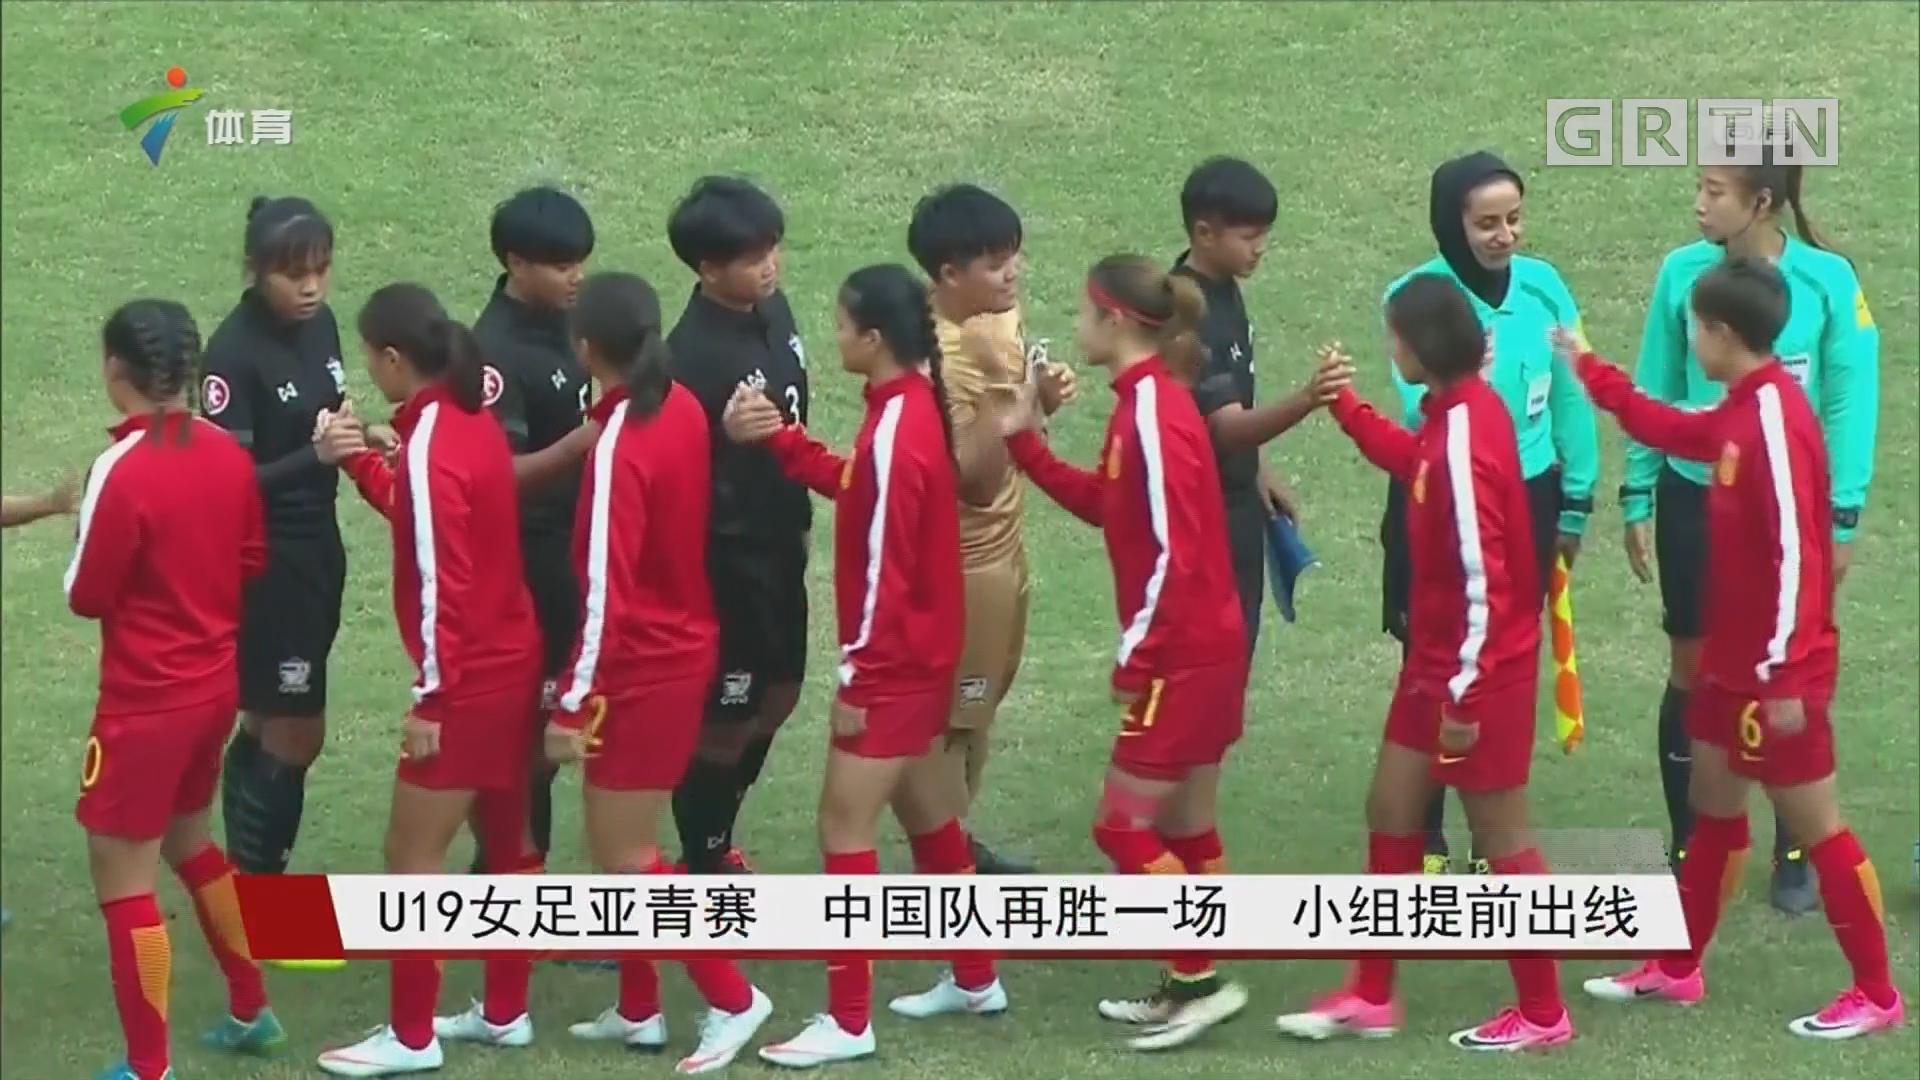 U19女足亚青赛 中国队再胜一场 小组提前出线